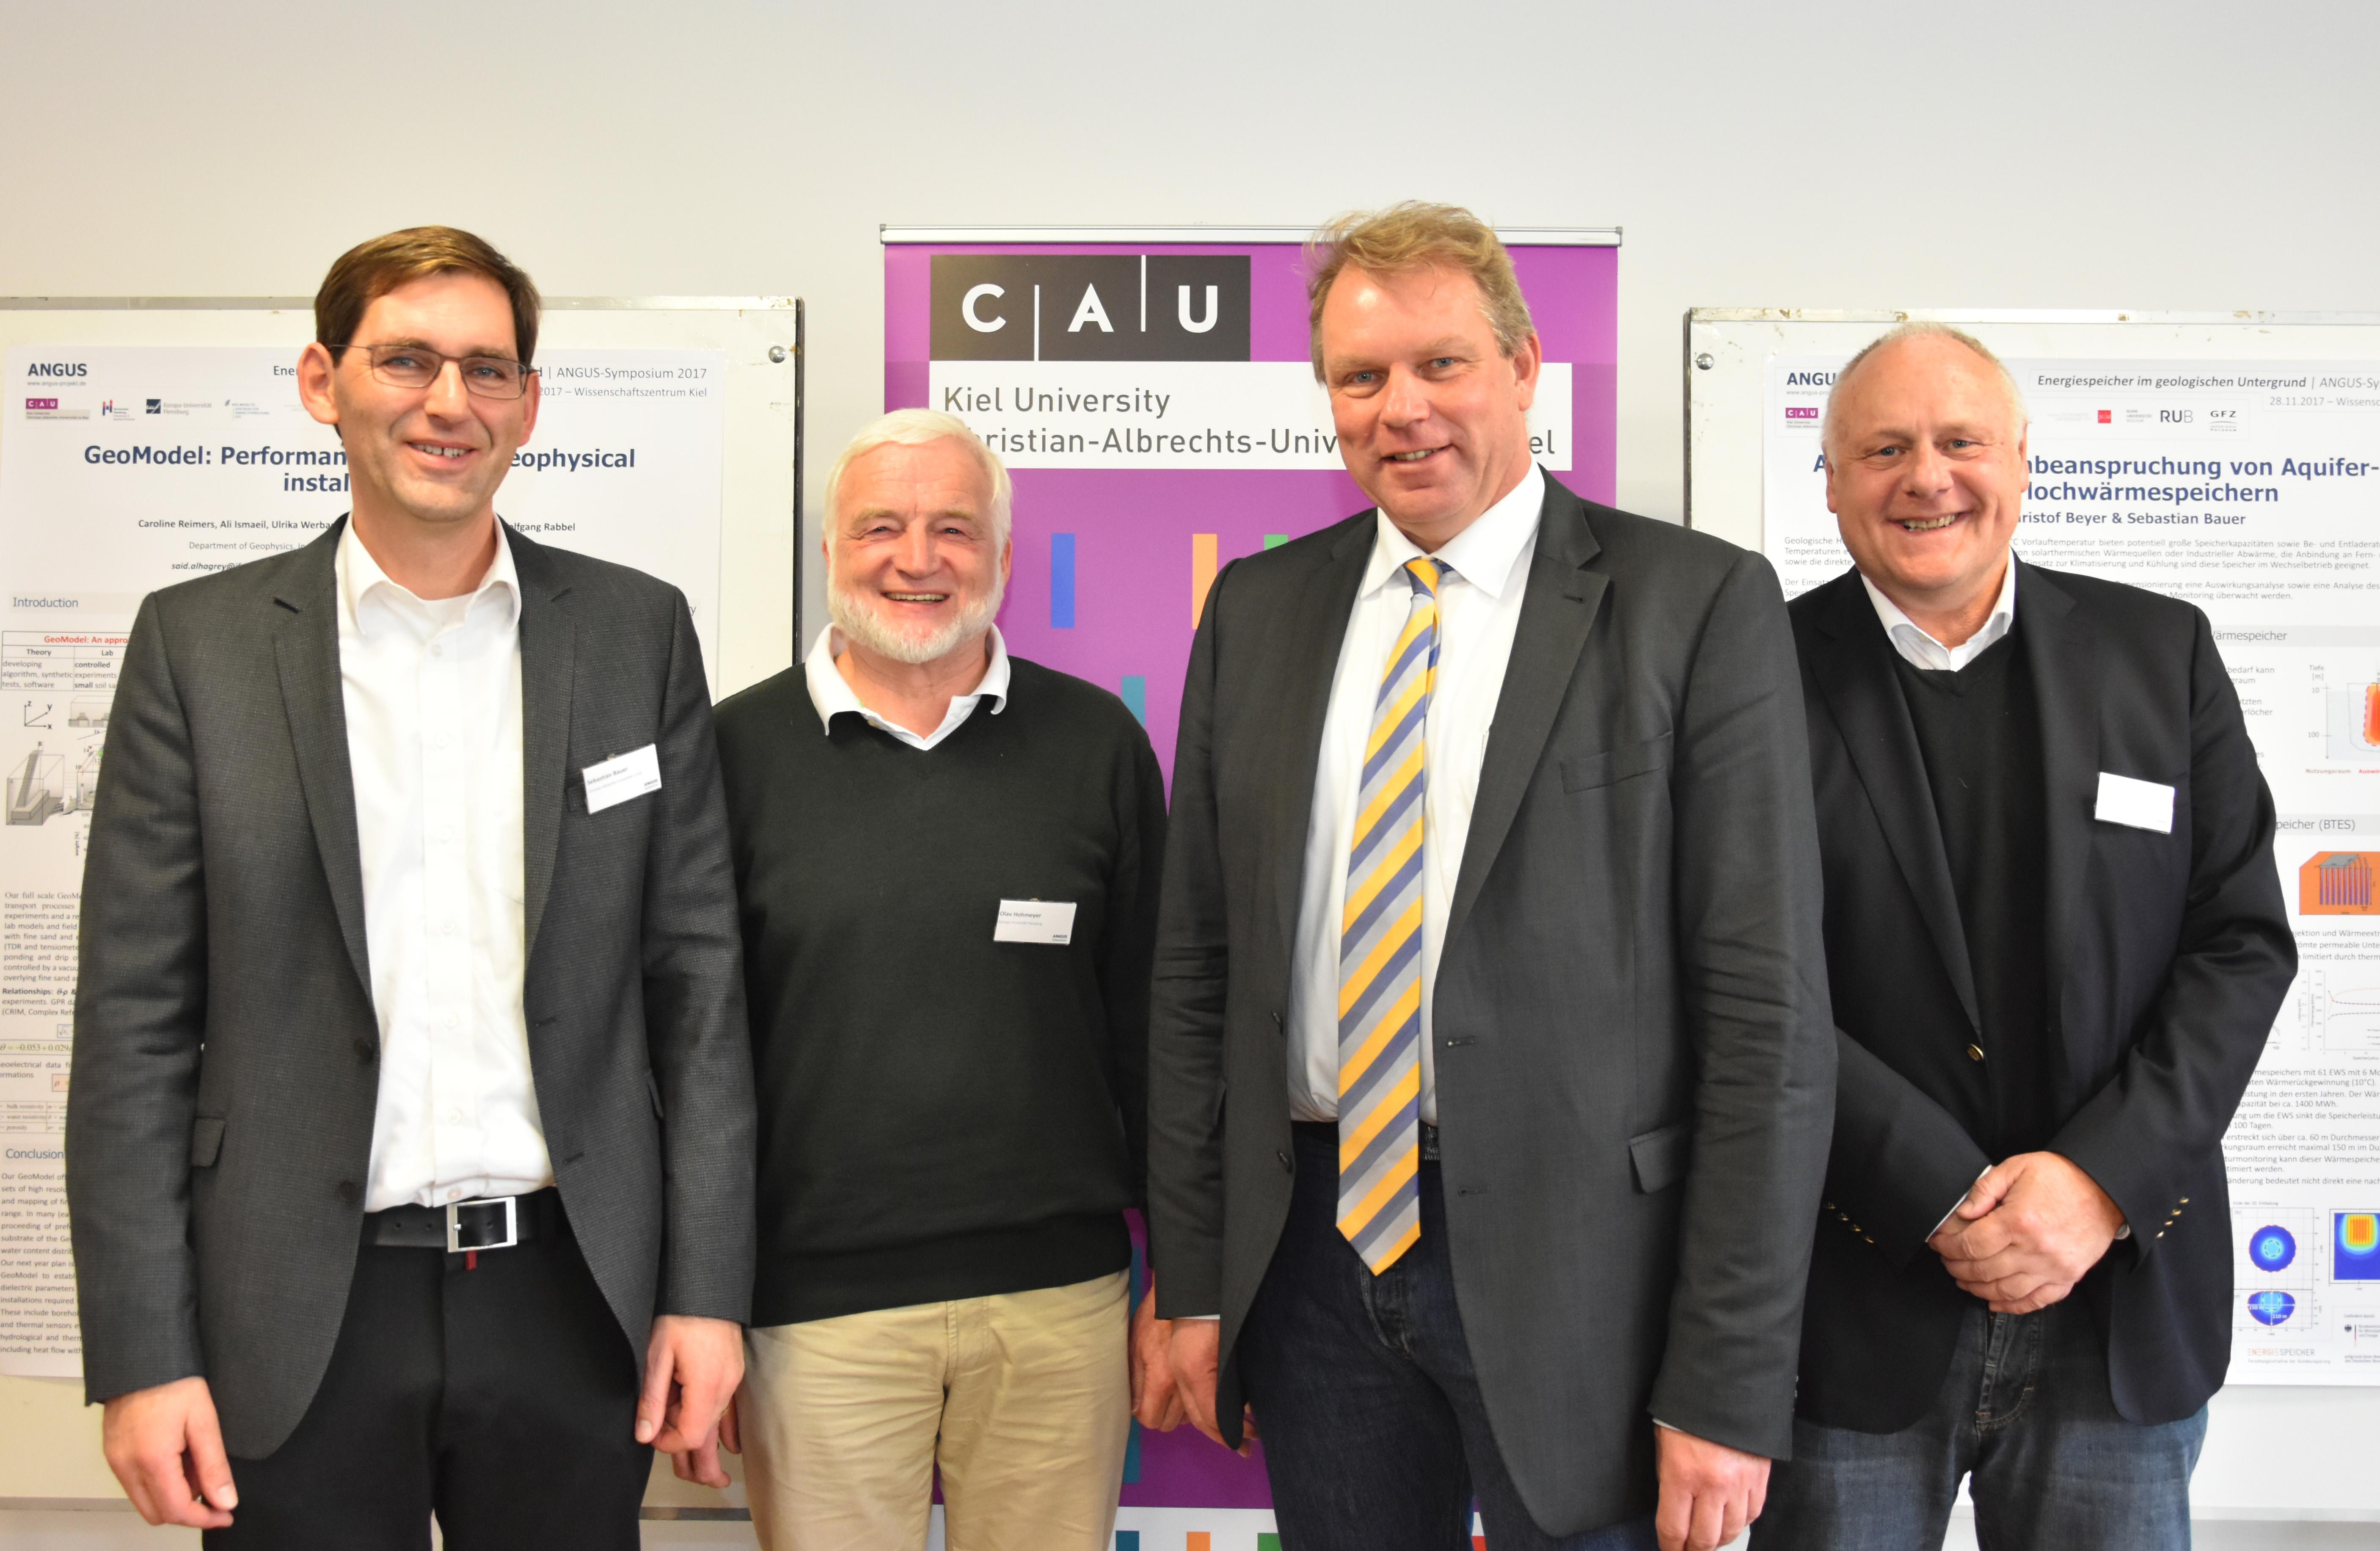 Präsentierten am 28. November das Forschungsprojekt ANGUS (v.l.): Sebastian Bauer, Olav Hohmeyer, Lutz Kipp, Andreas Dahmke. Foto/Copyright: Raissa Maas, CAU